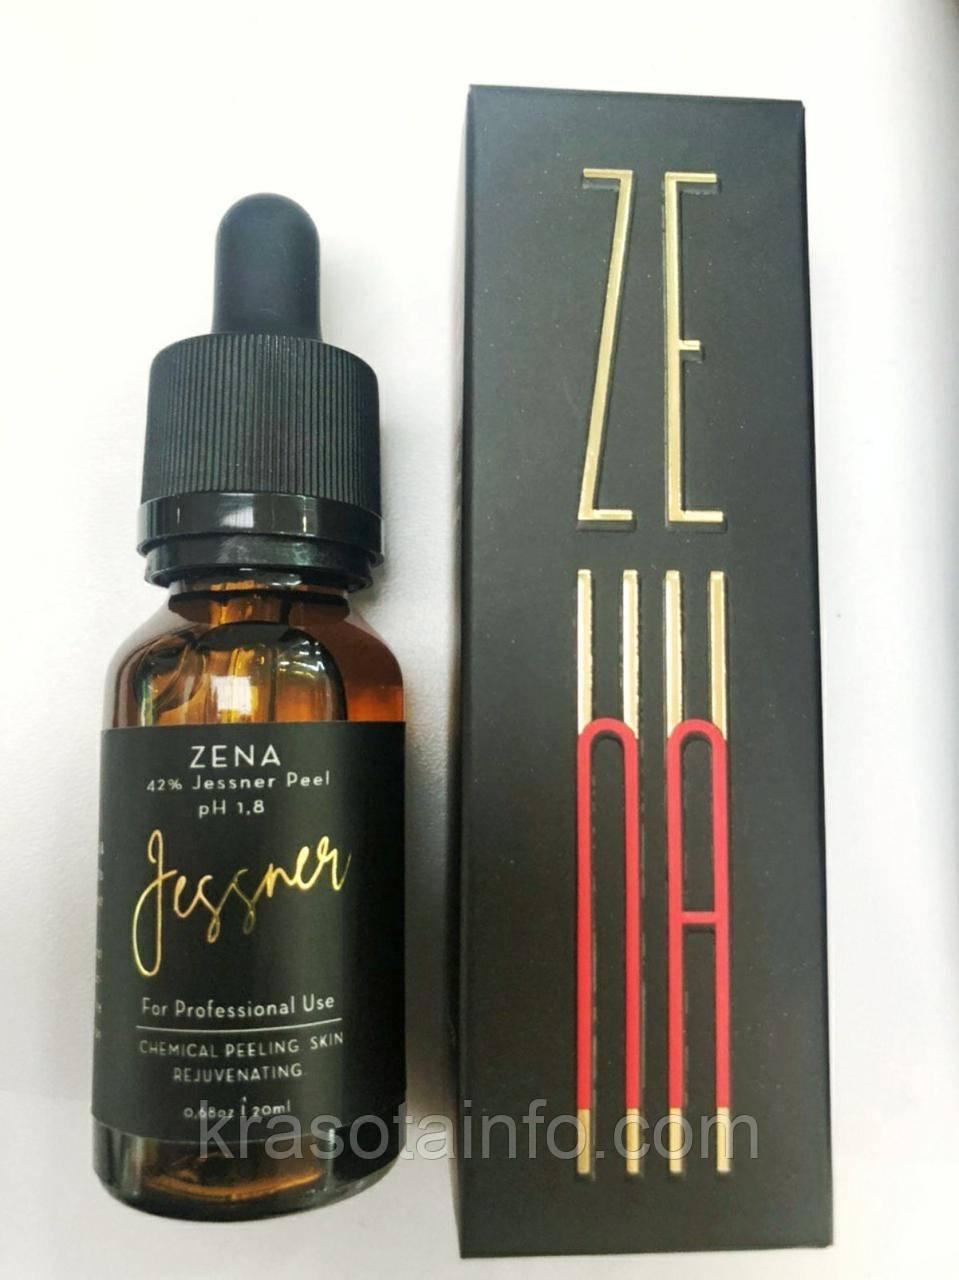 Пилинг Джесснера Zena 42%, pH 1,8, 20 ml